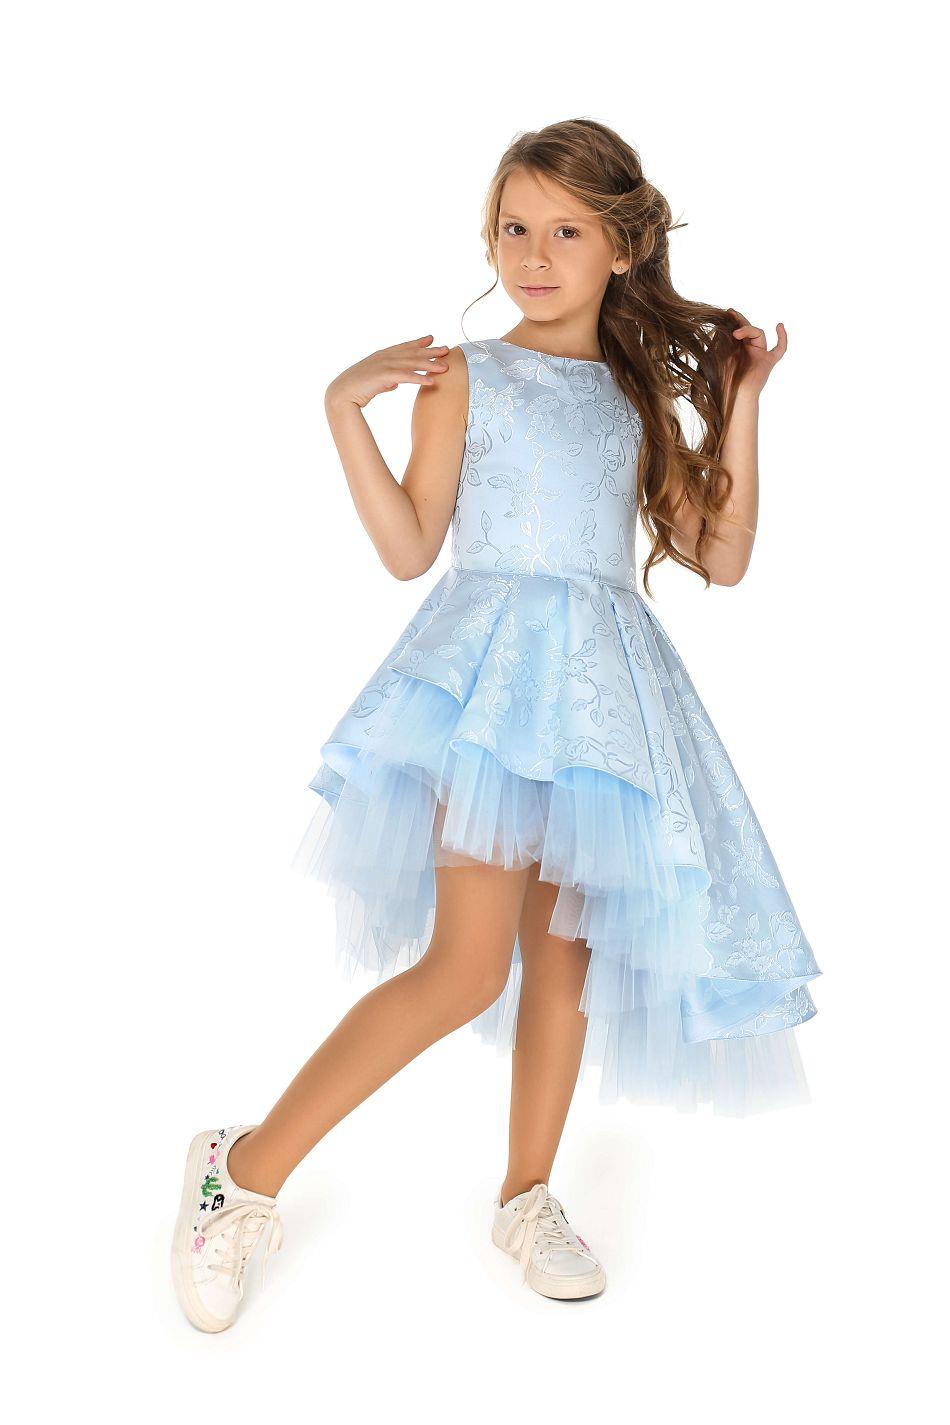 Святкова сукня на дівчинку